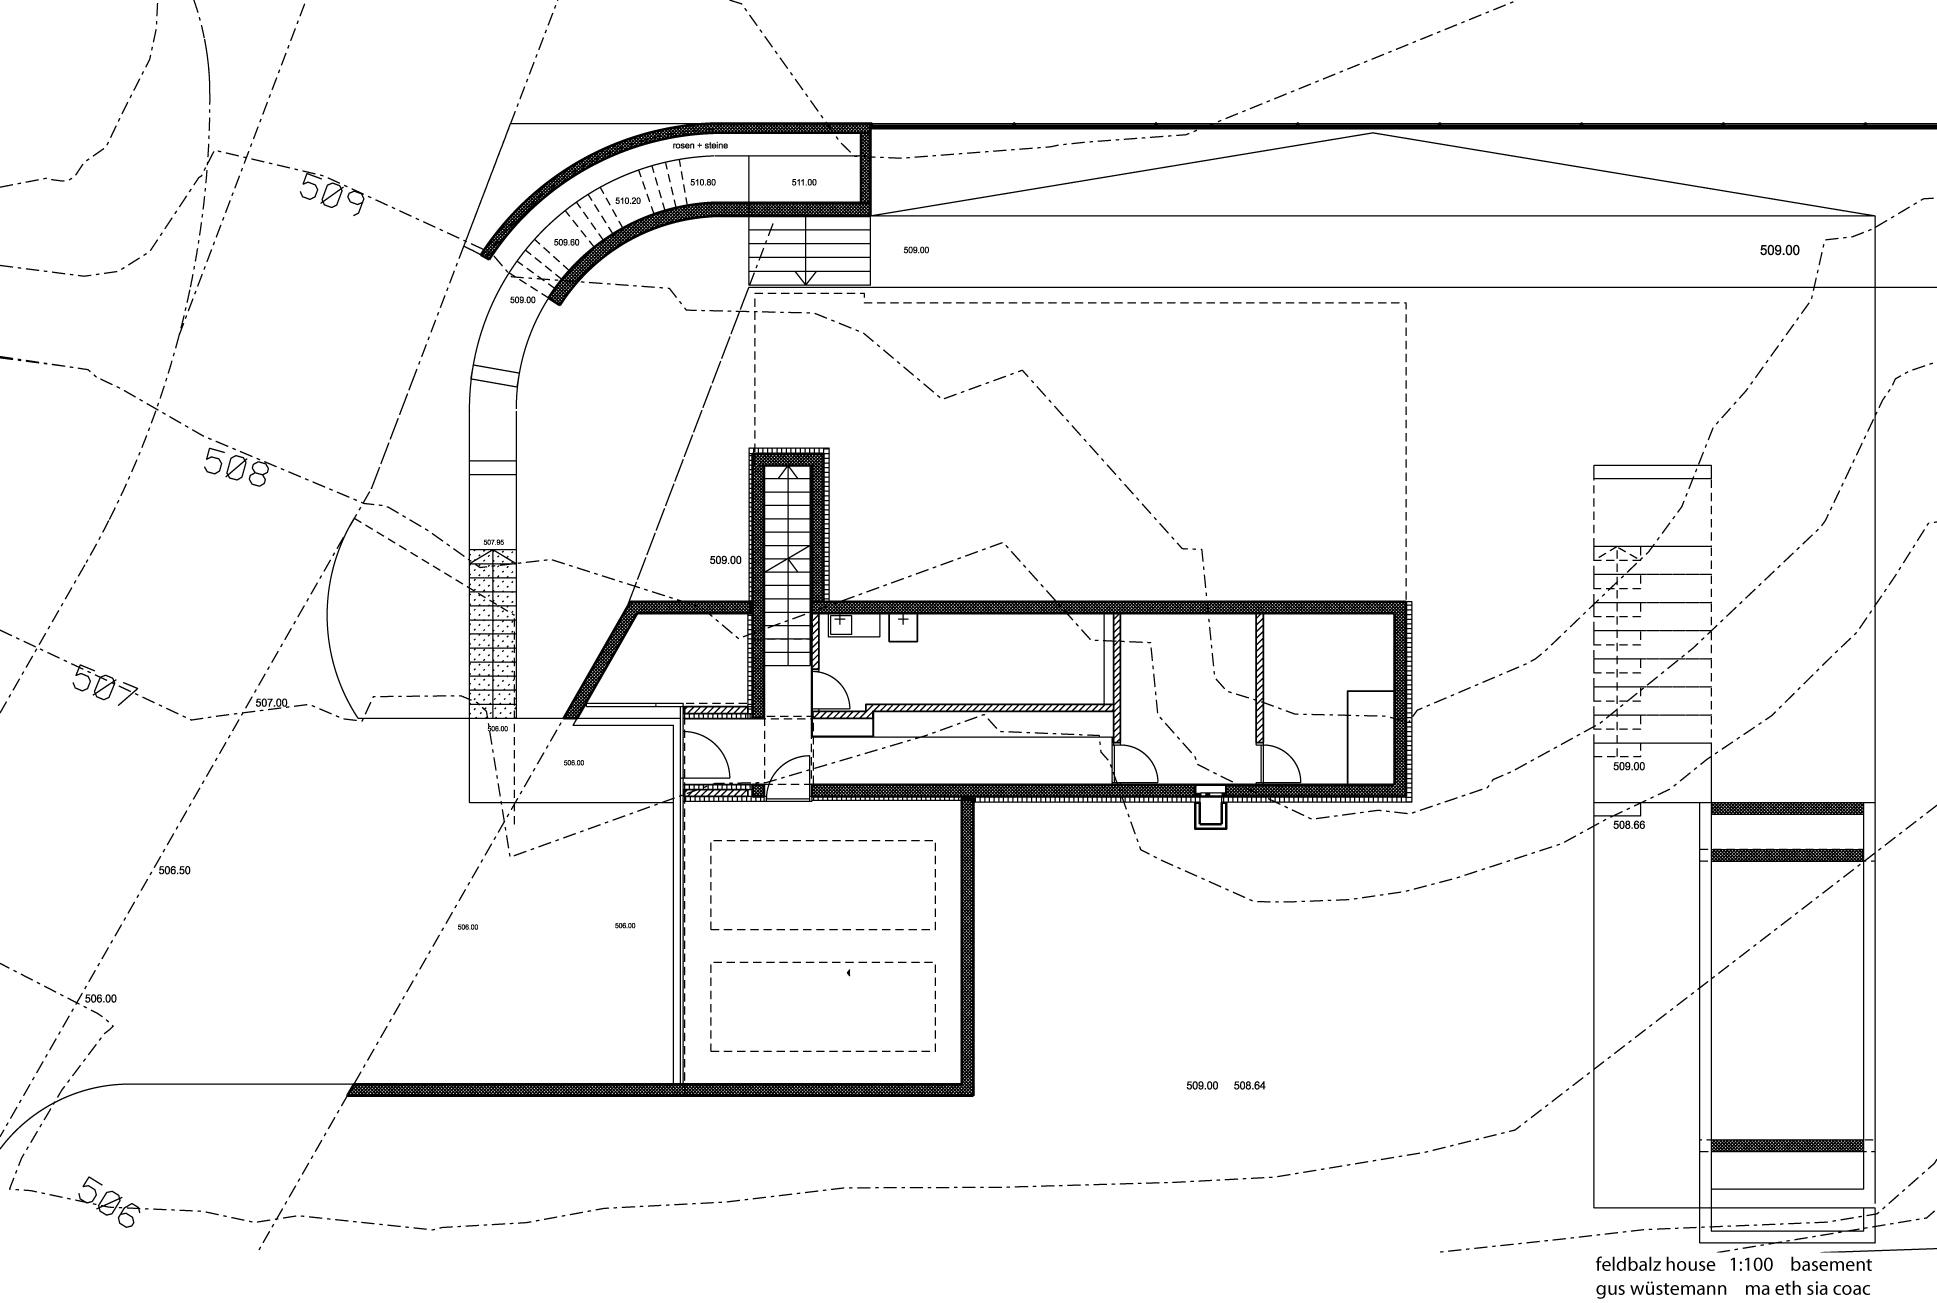 Feldbalz House / Gus Wüstemann